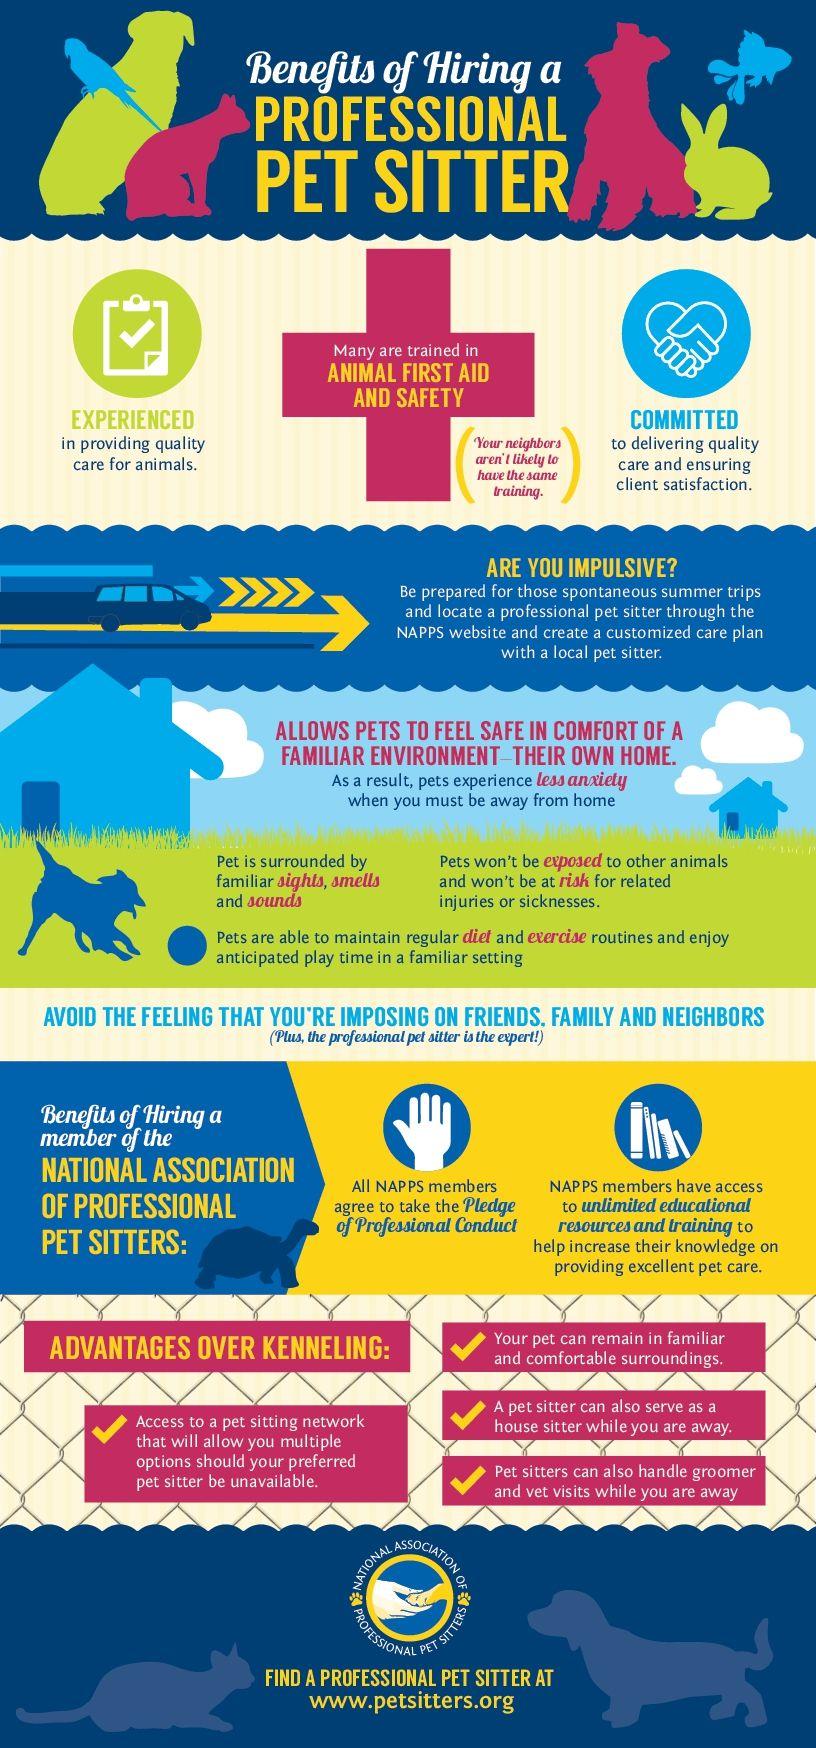 Benefits of hiring a professional pet sitter pet sitters